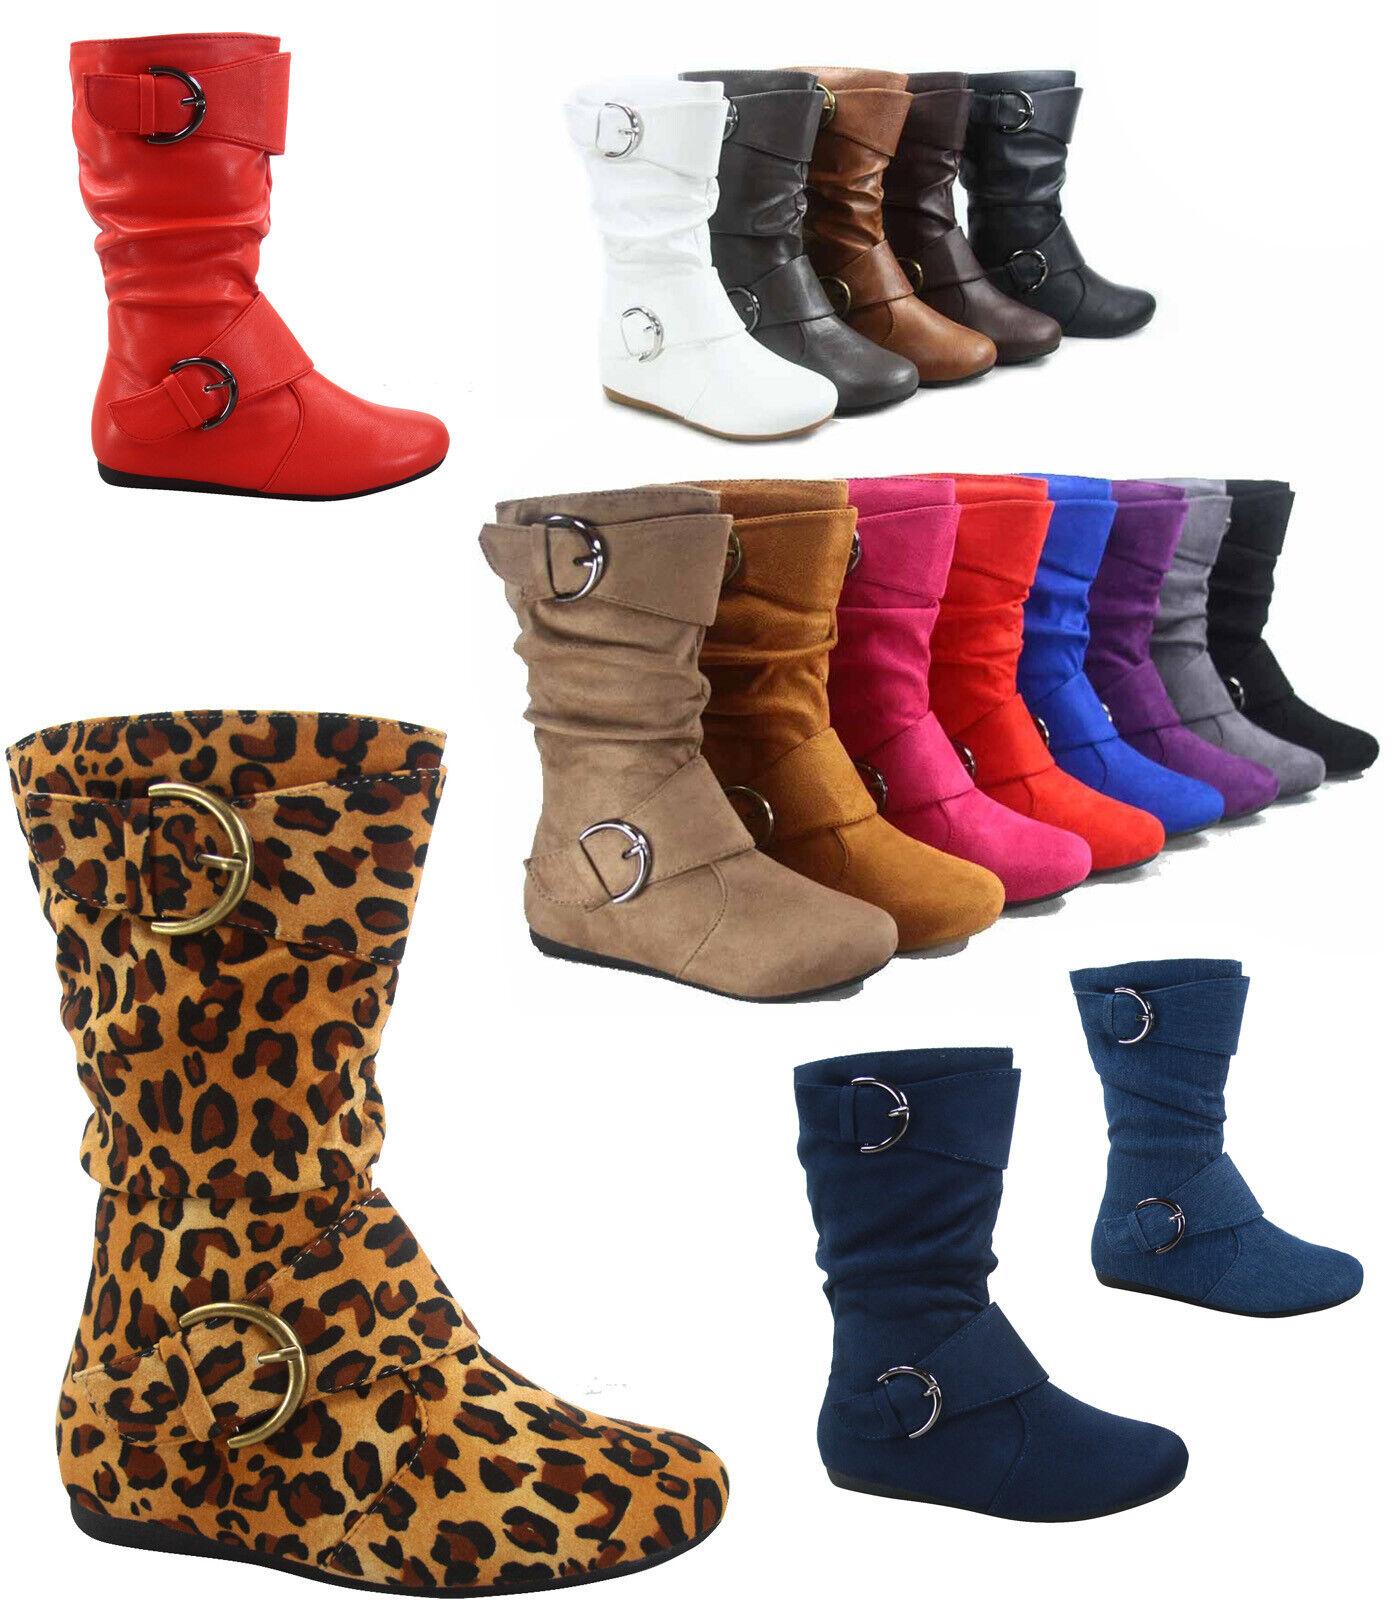 12 Colors Cute Causal Flat Buckle Zip Mid-Calf Girl's Kid's